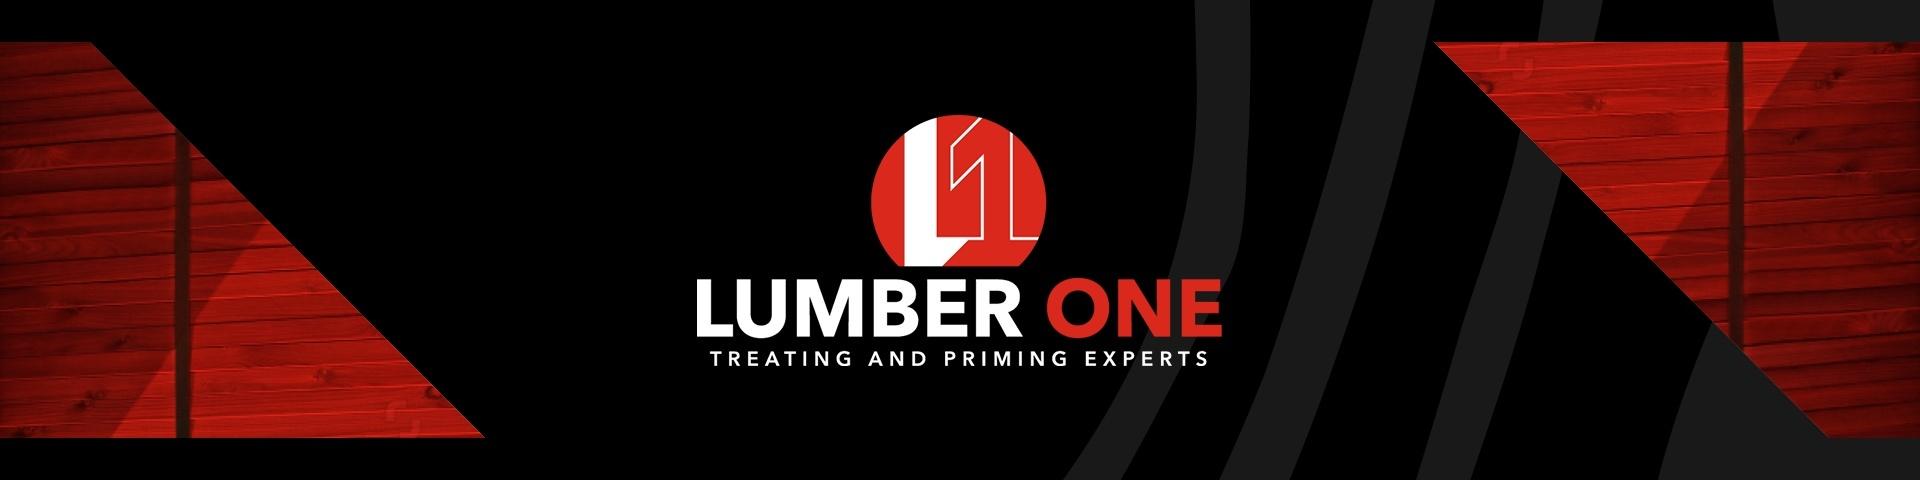 Lumber One (Timbalink)